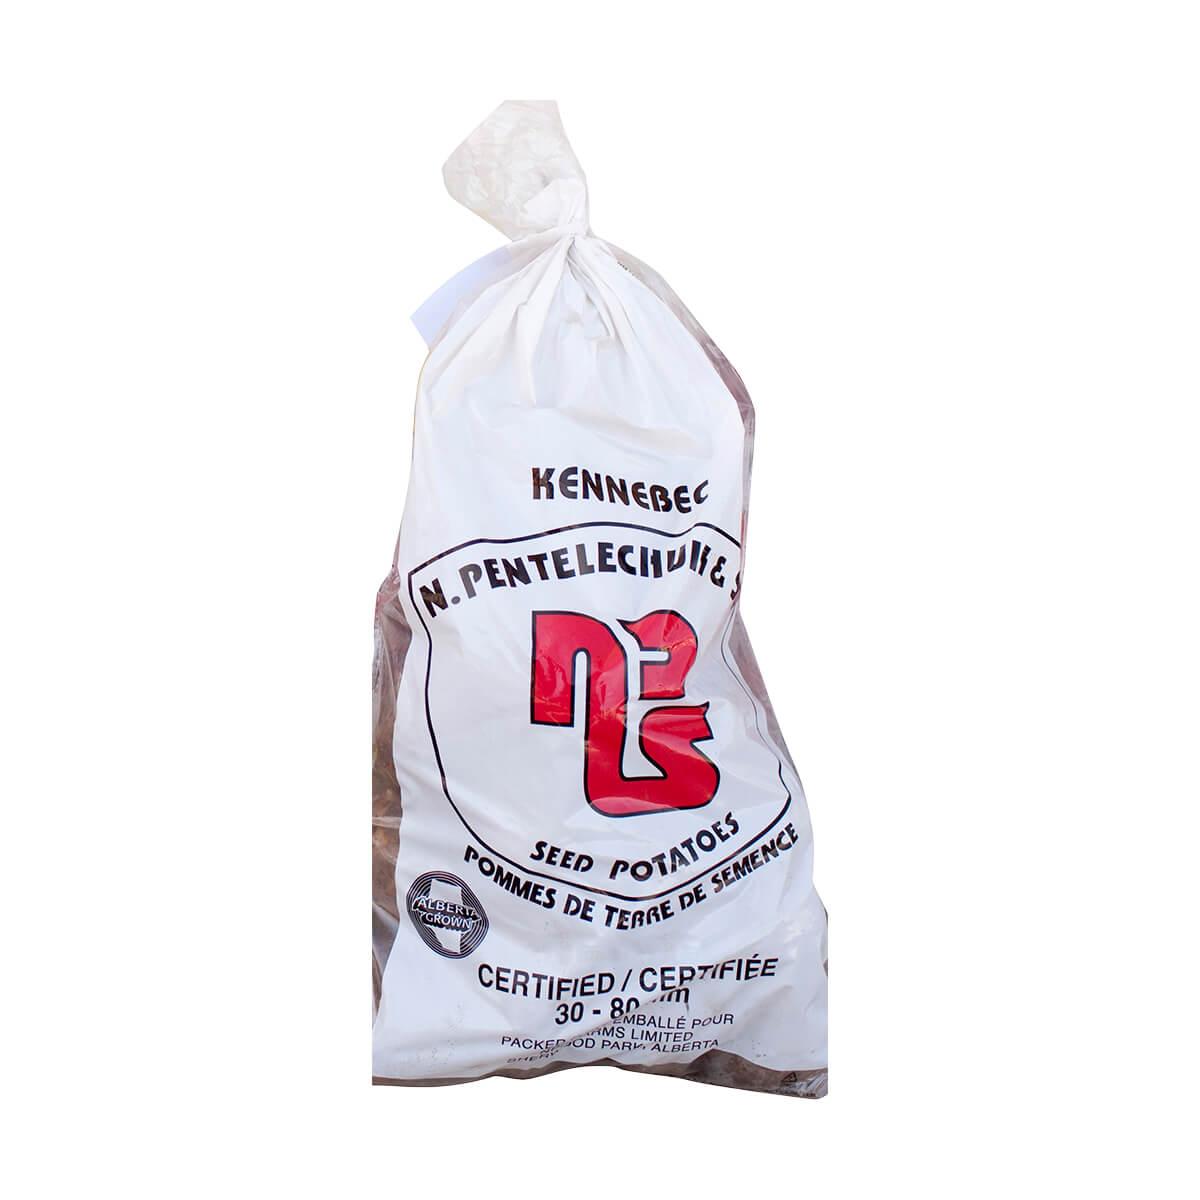 Kennebec Seed Potatoes - 10lb